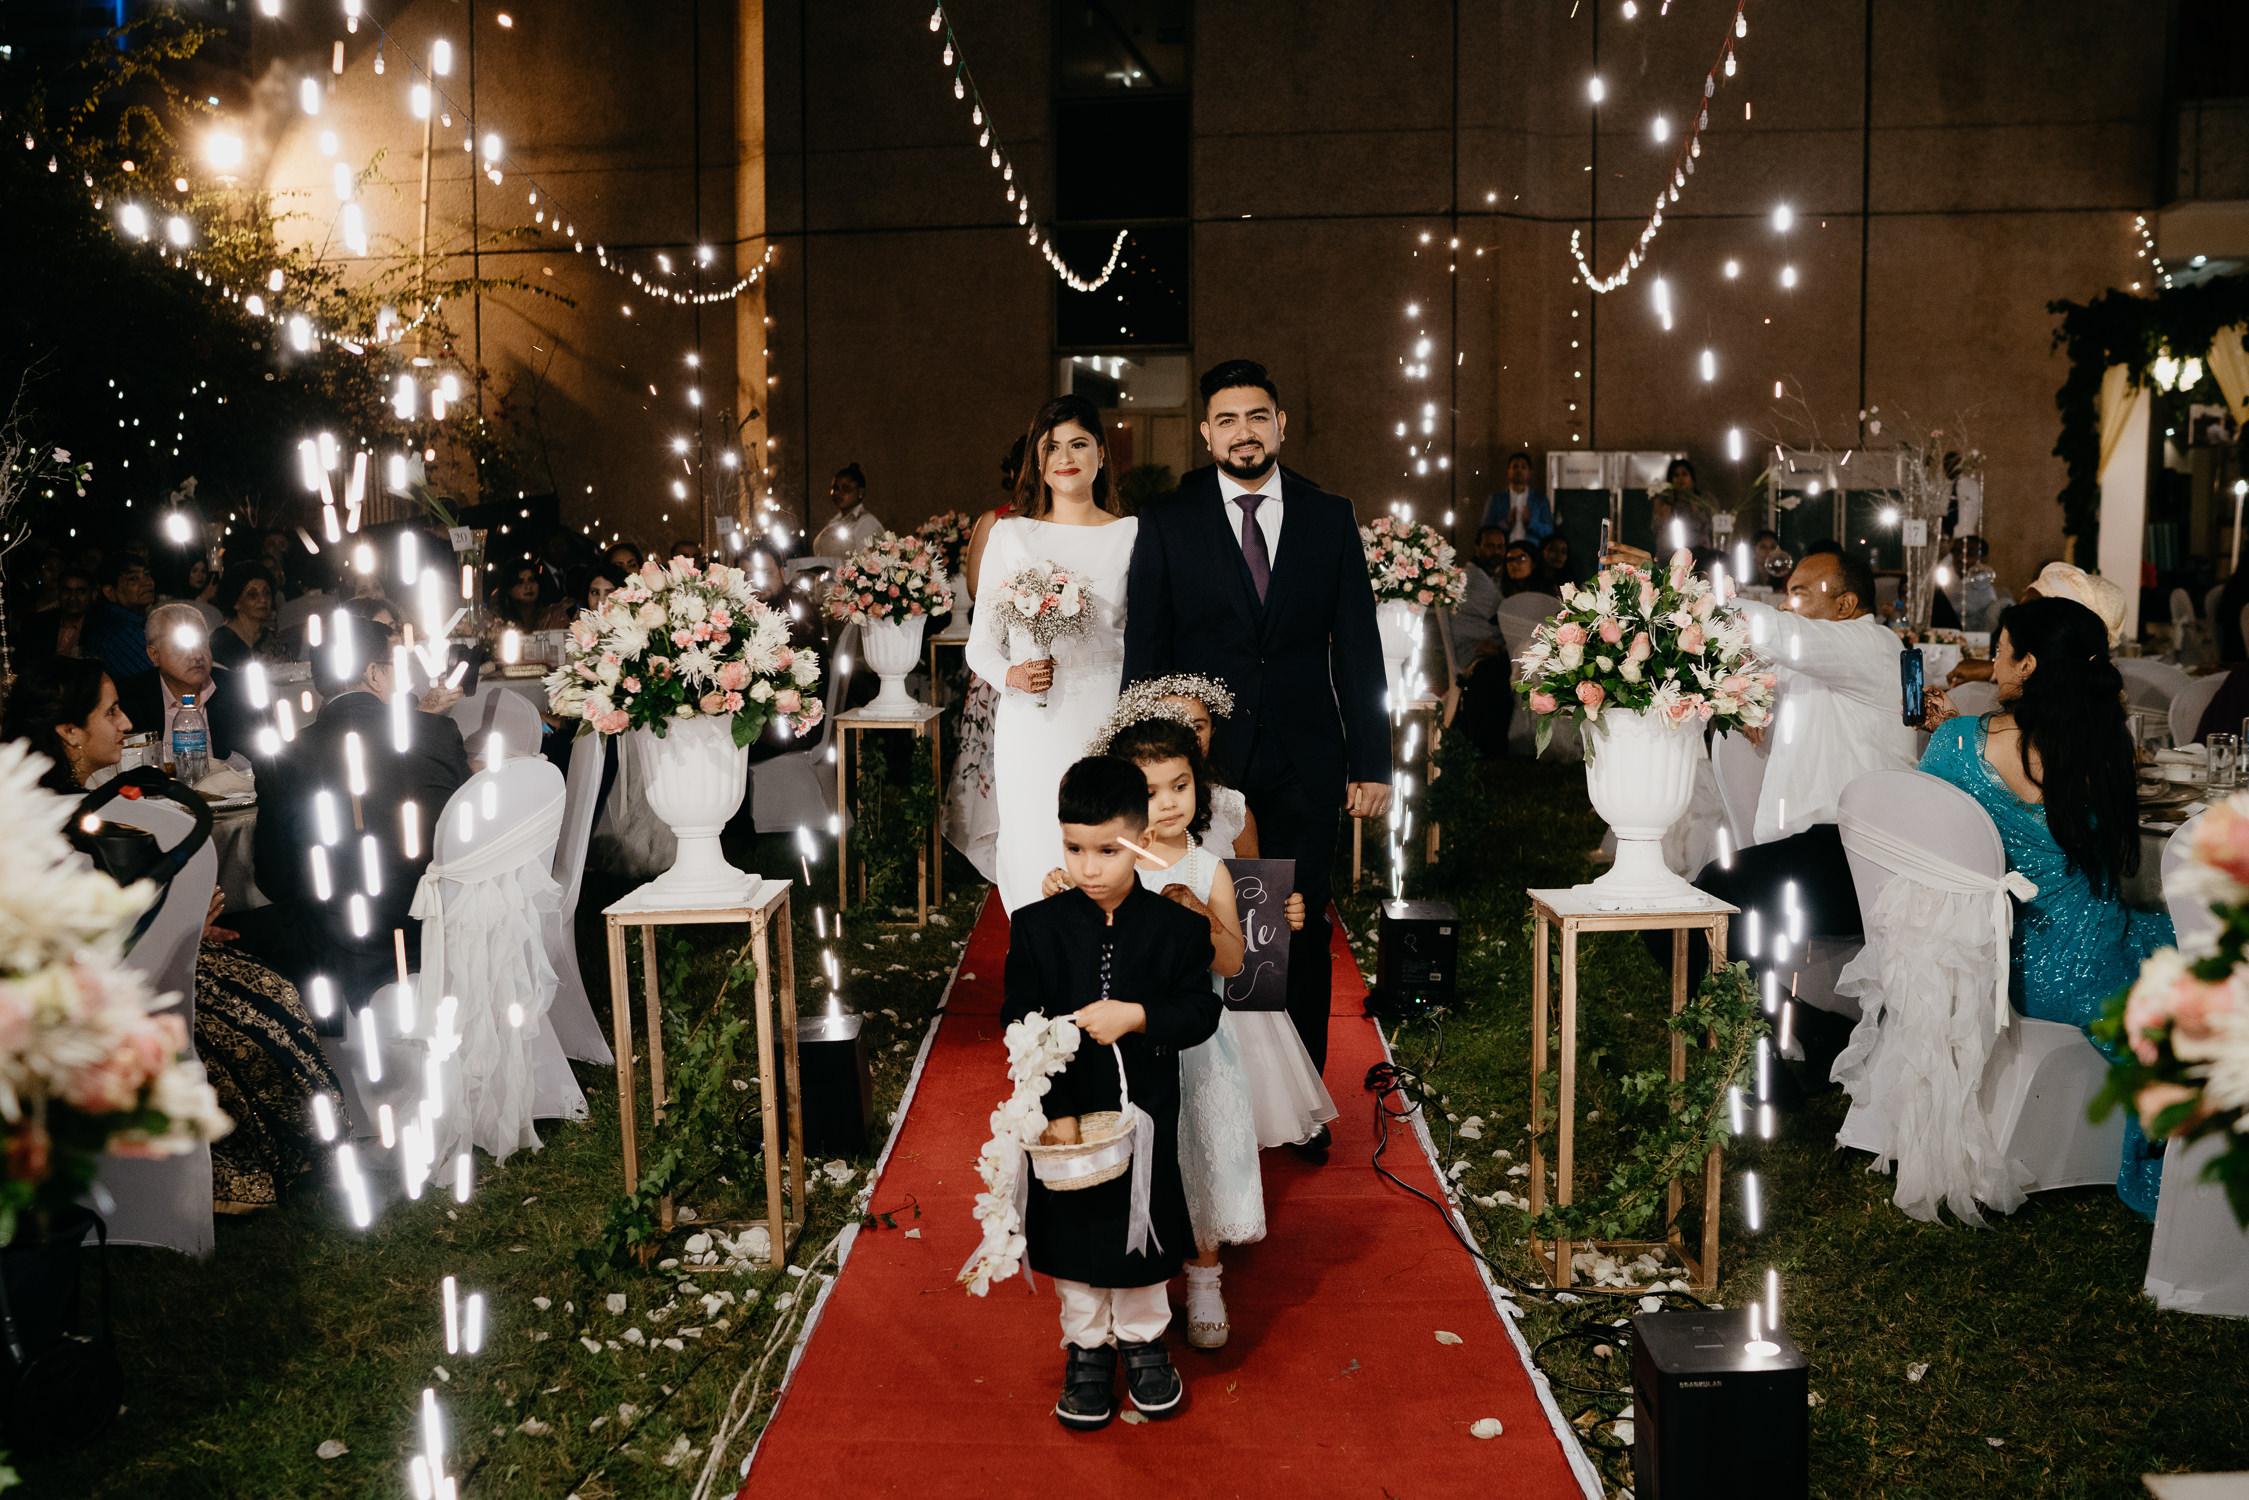 bruiloft ceremonie tanzania fotograaf mark hadden